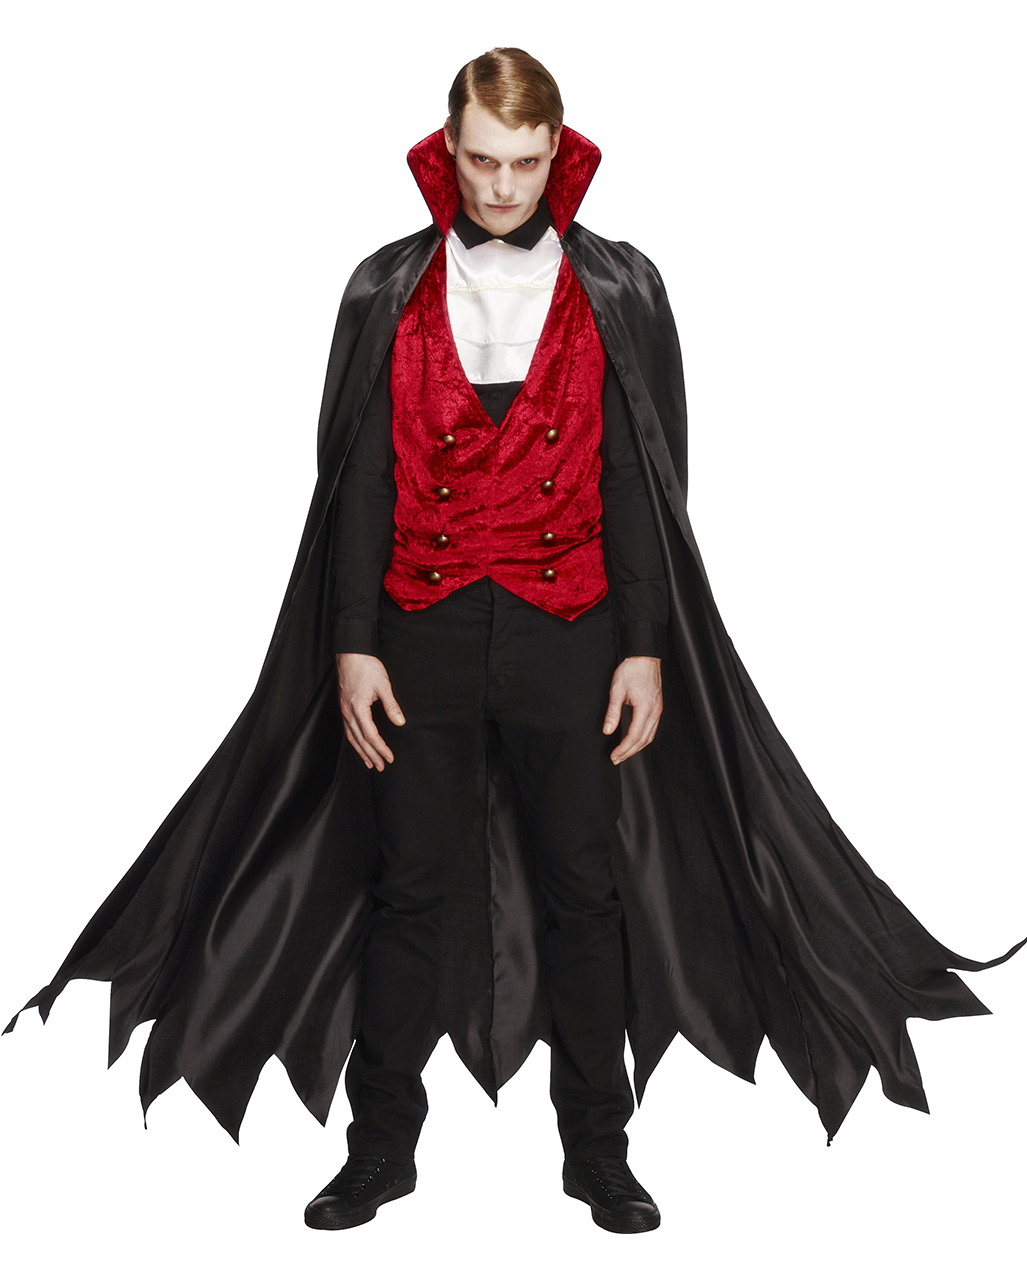 Vampir Kostum Fur Manner Stilvolles Dracula Kostum Karneval Universe